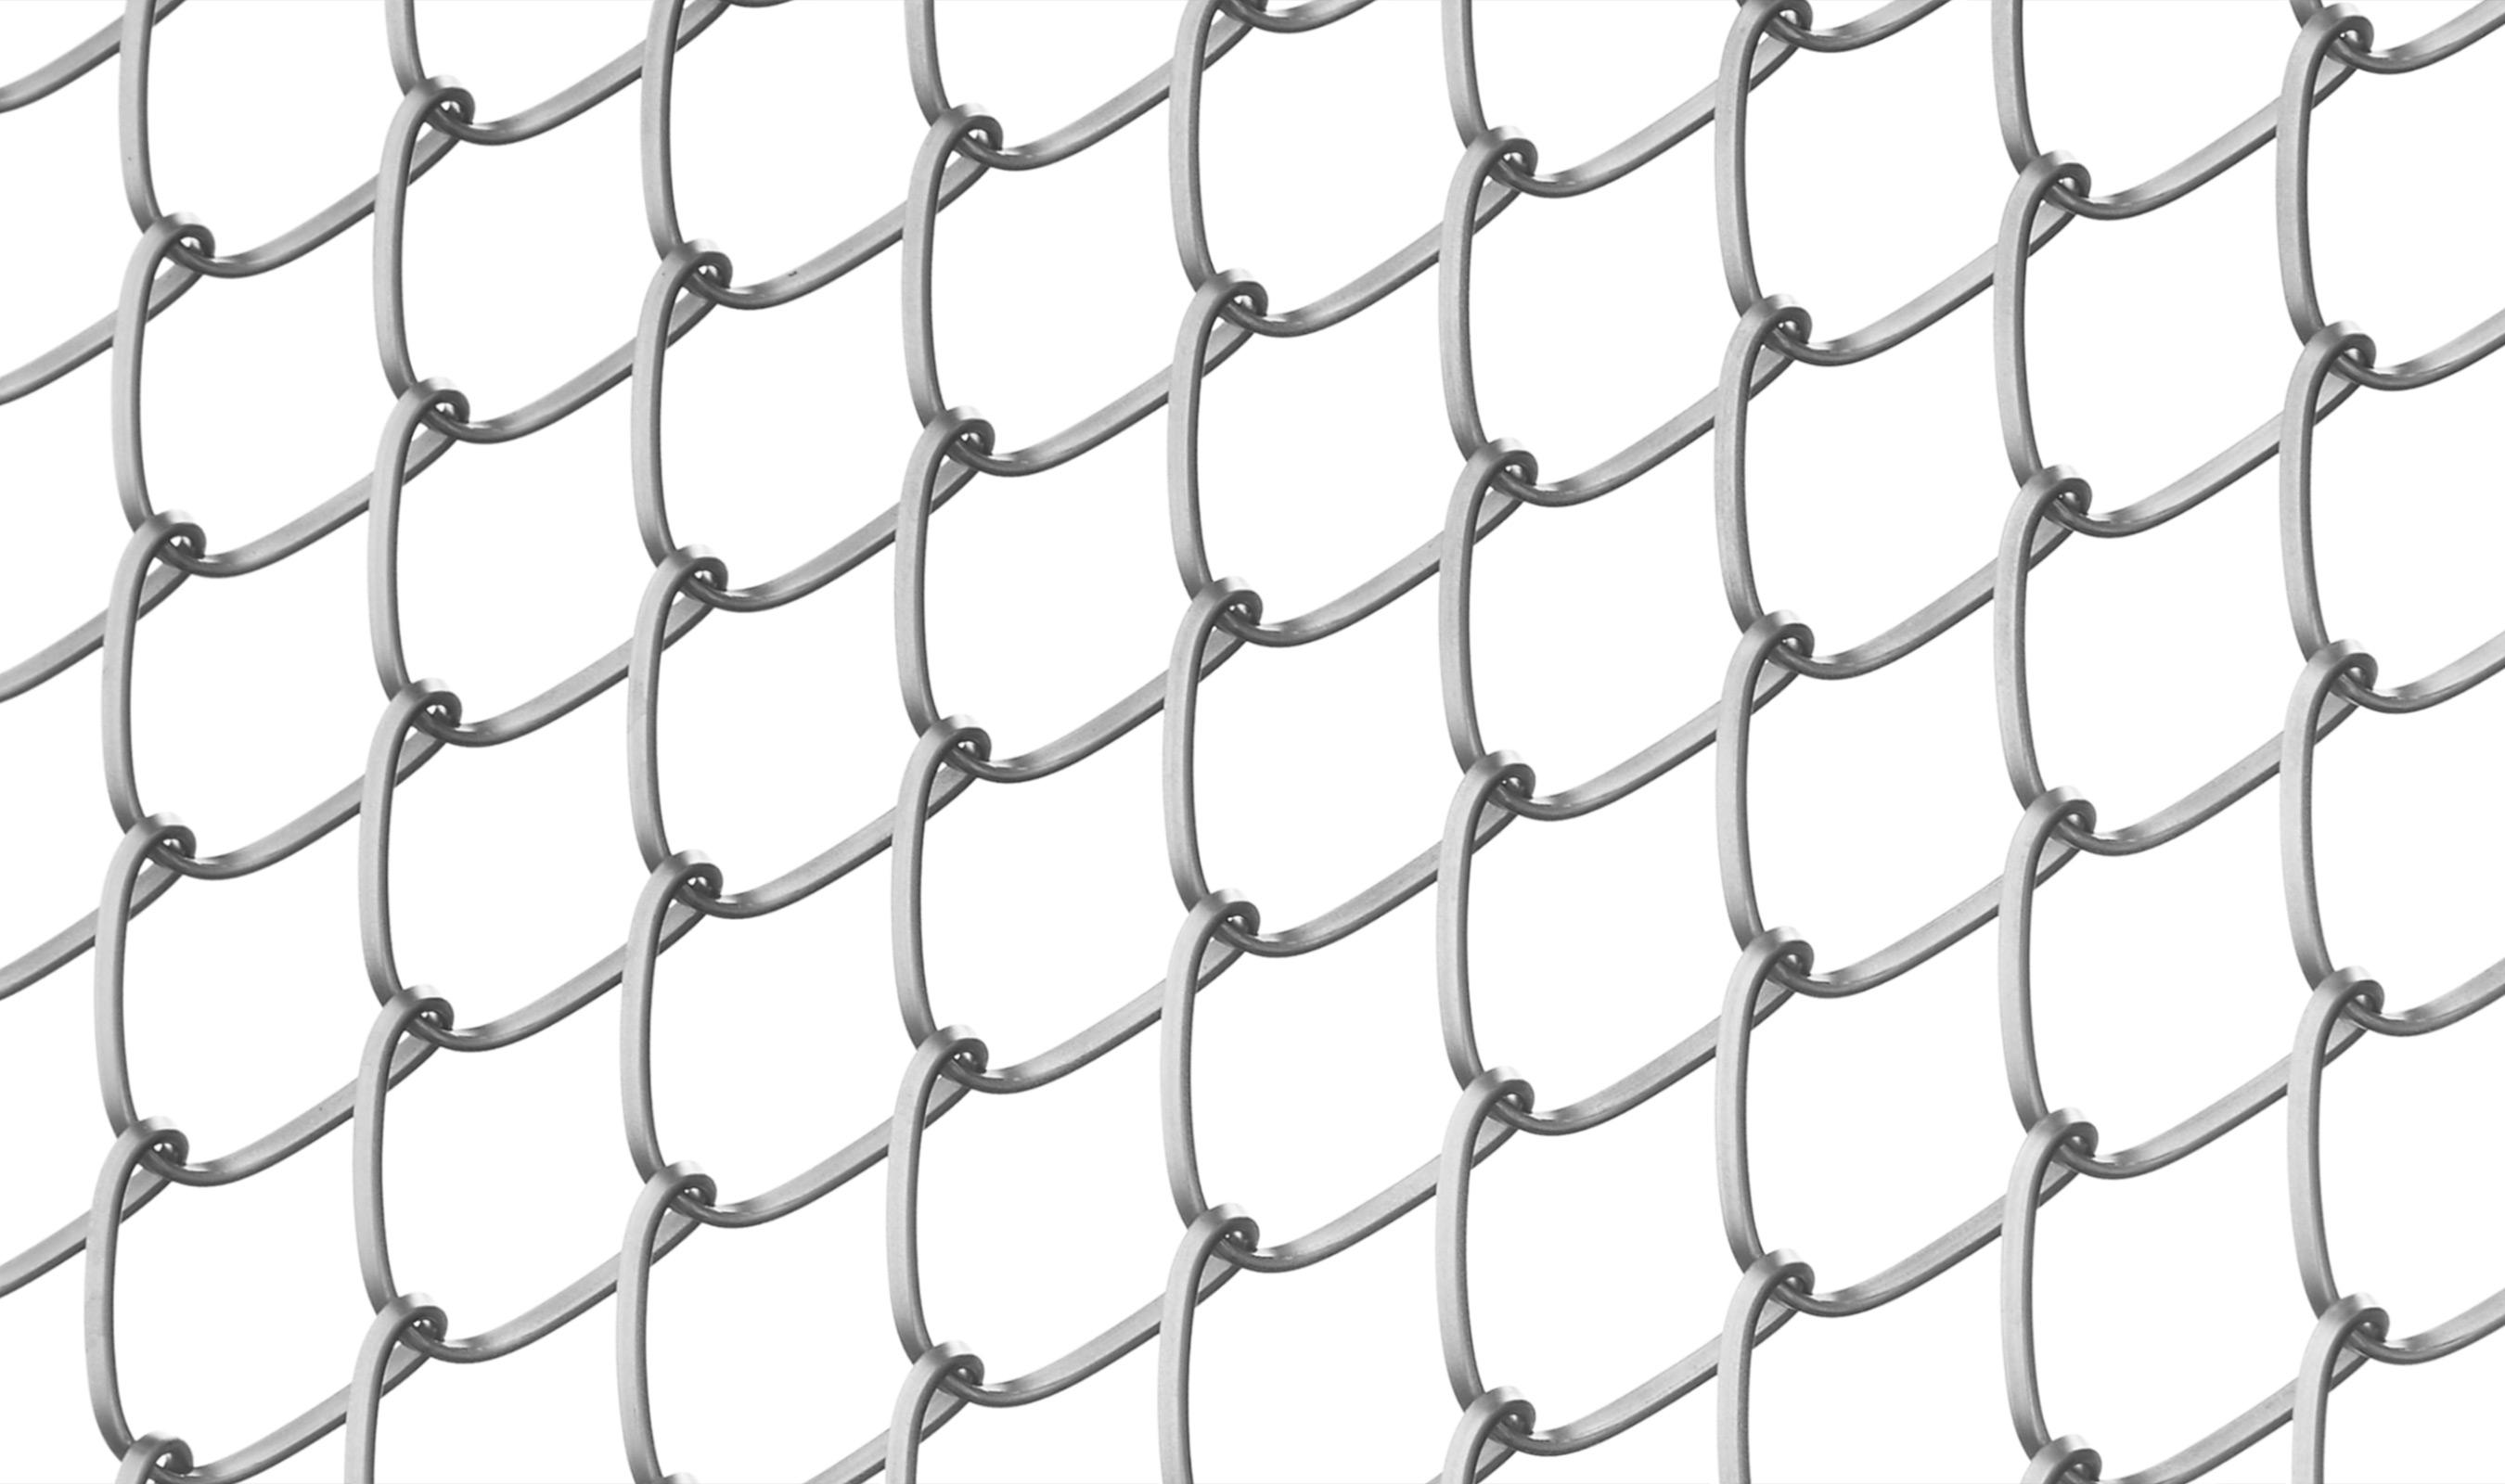 Flow Flat flexible mesh